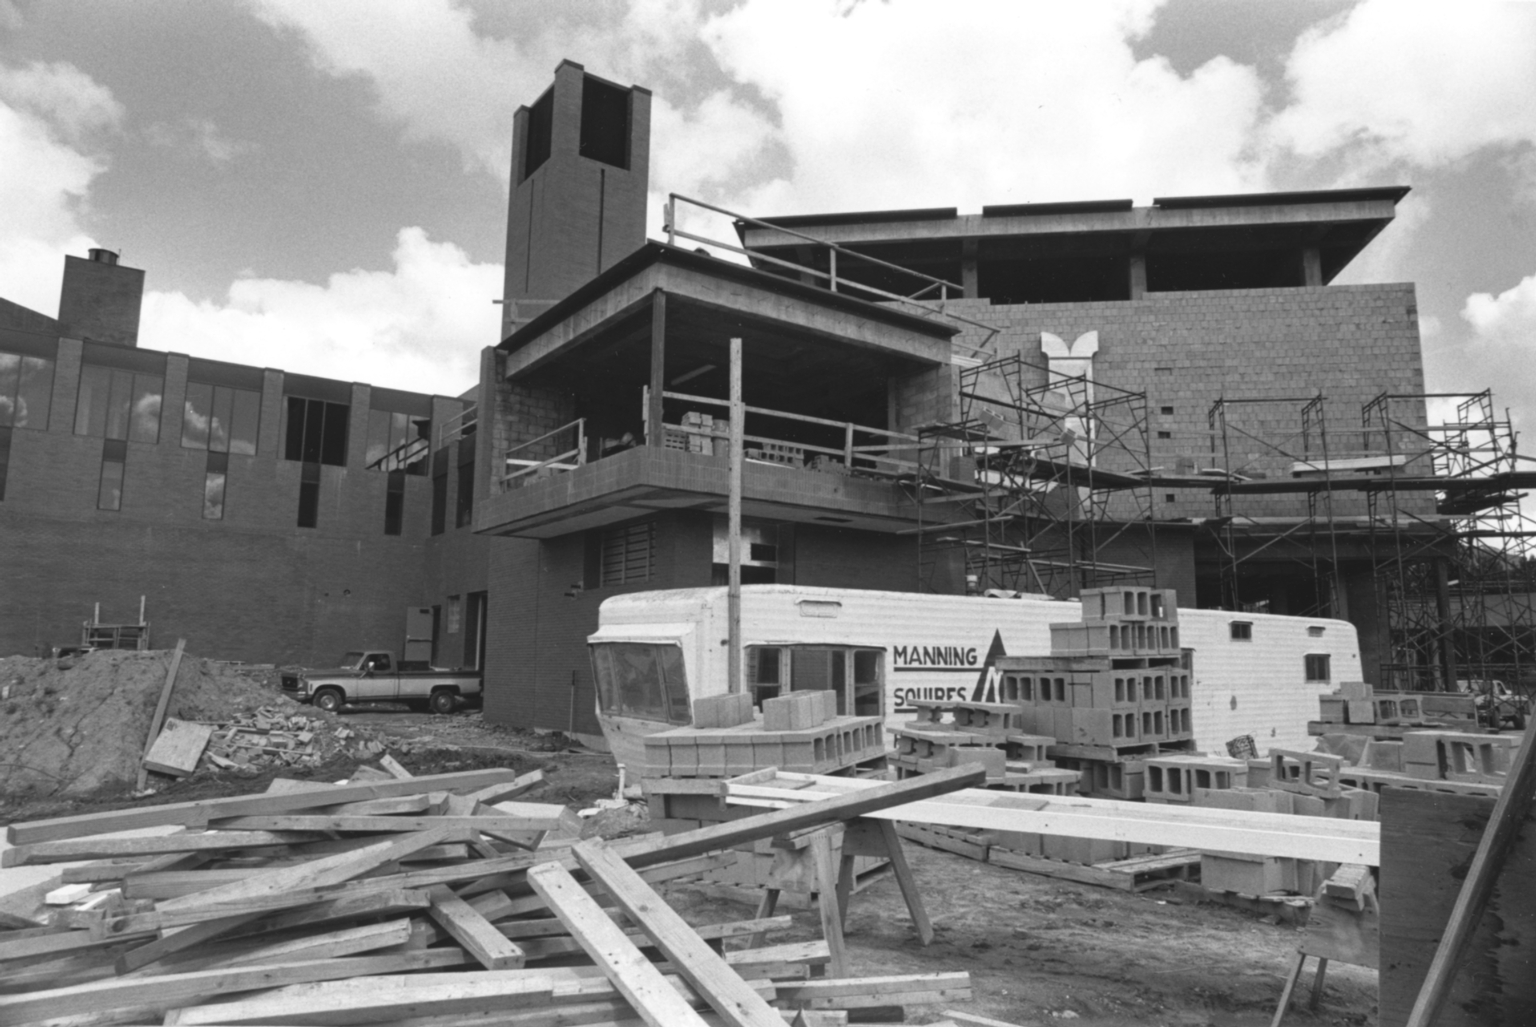 Construction of Kilian J. and Caroline F. Schmitt Interfaith Center